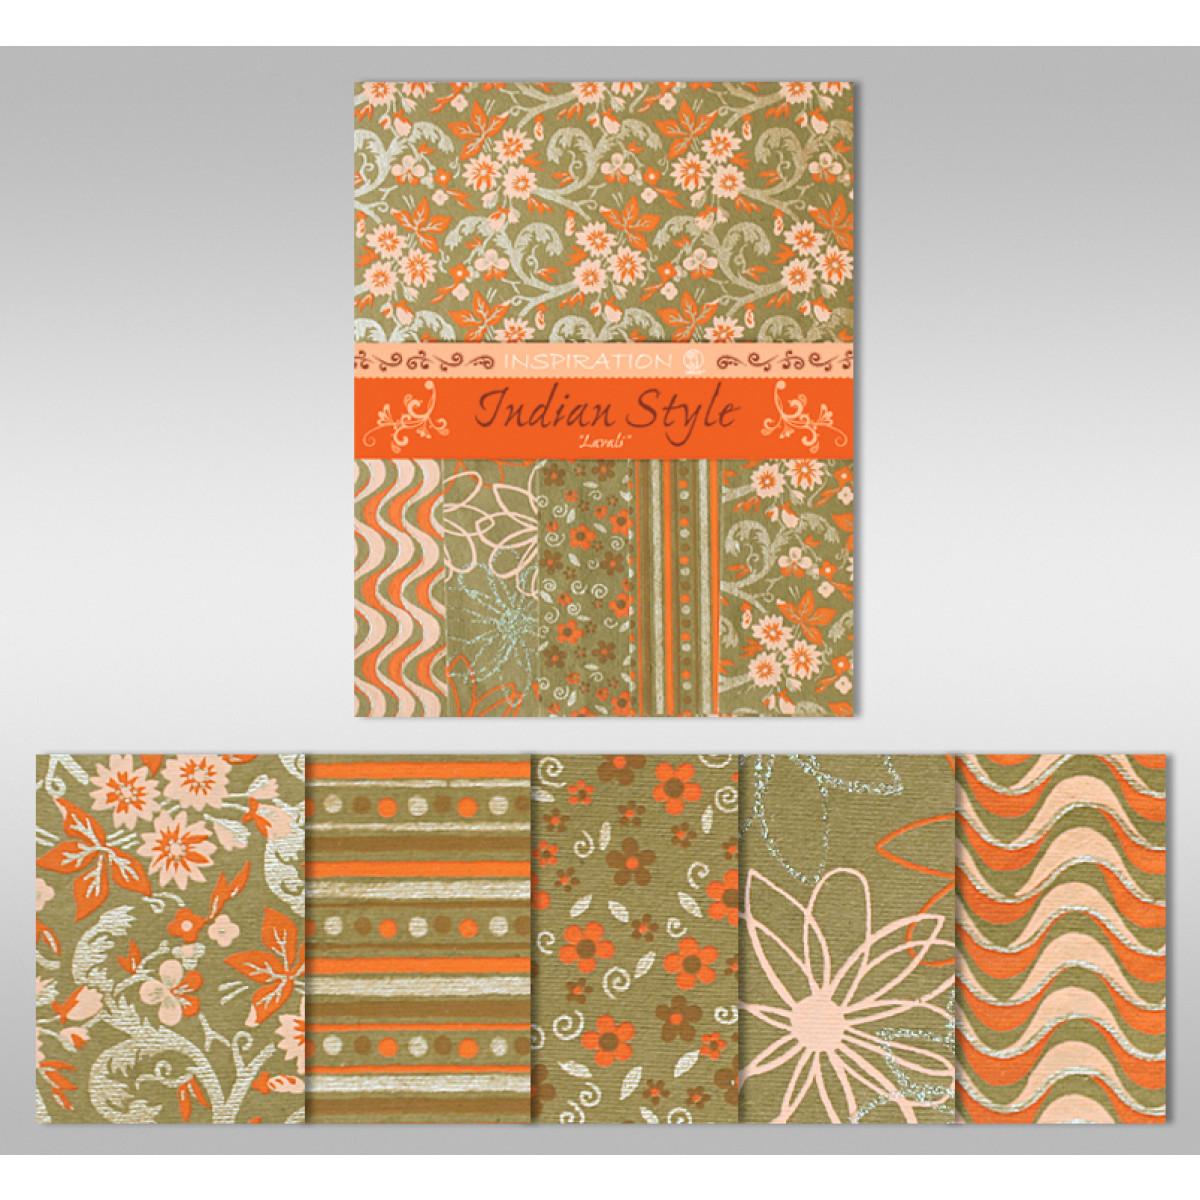 "Indian Style ""Lavali"" 21,6 x 28 cm - 5 Blatt sortiert"